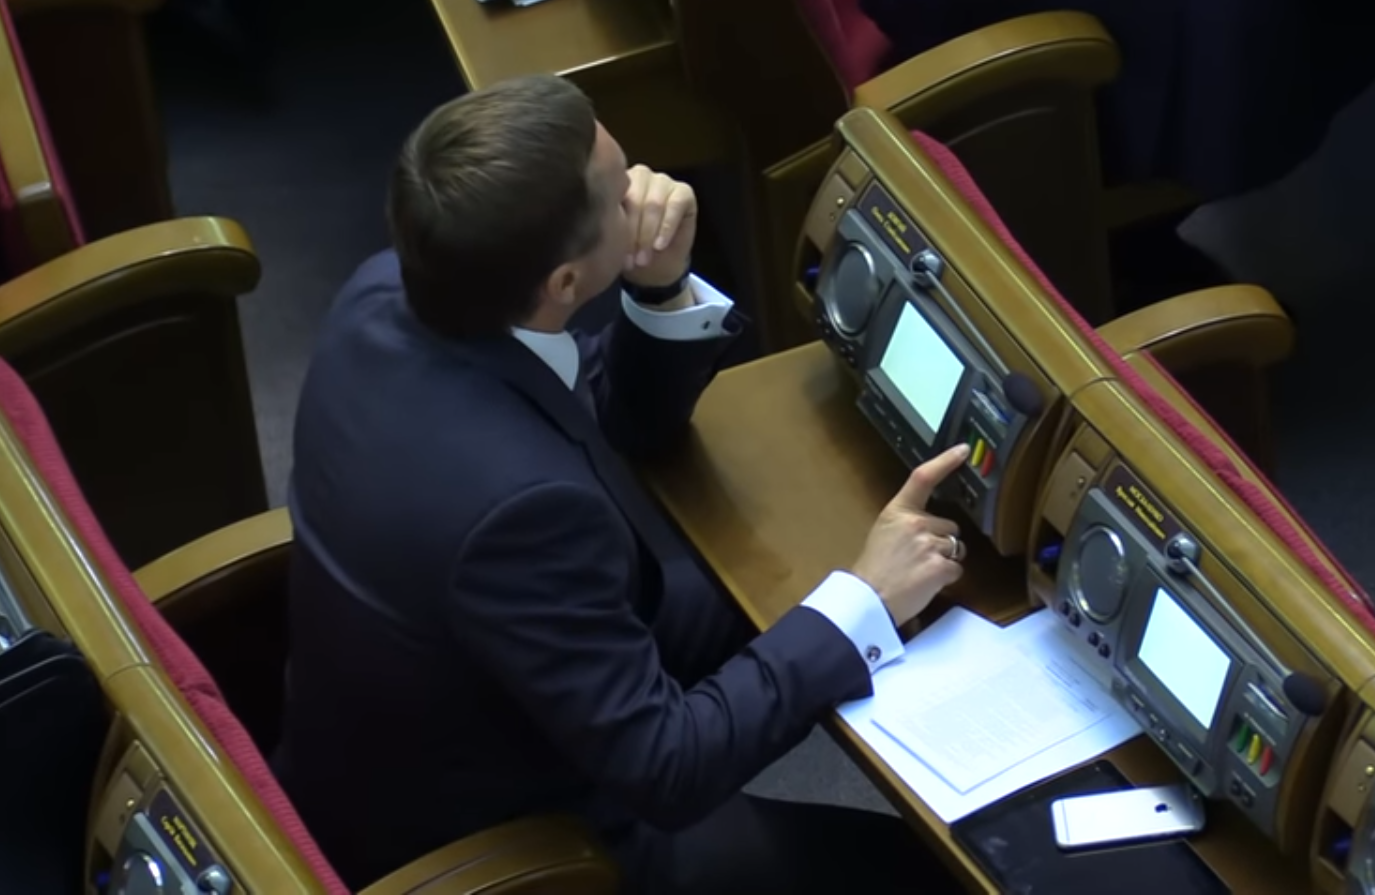 За себя и за того парня: запорожский нардеп в Раде кнопкодавил сразу за двух однопартийцев - ВИДЕО